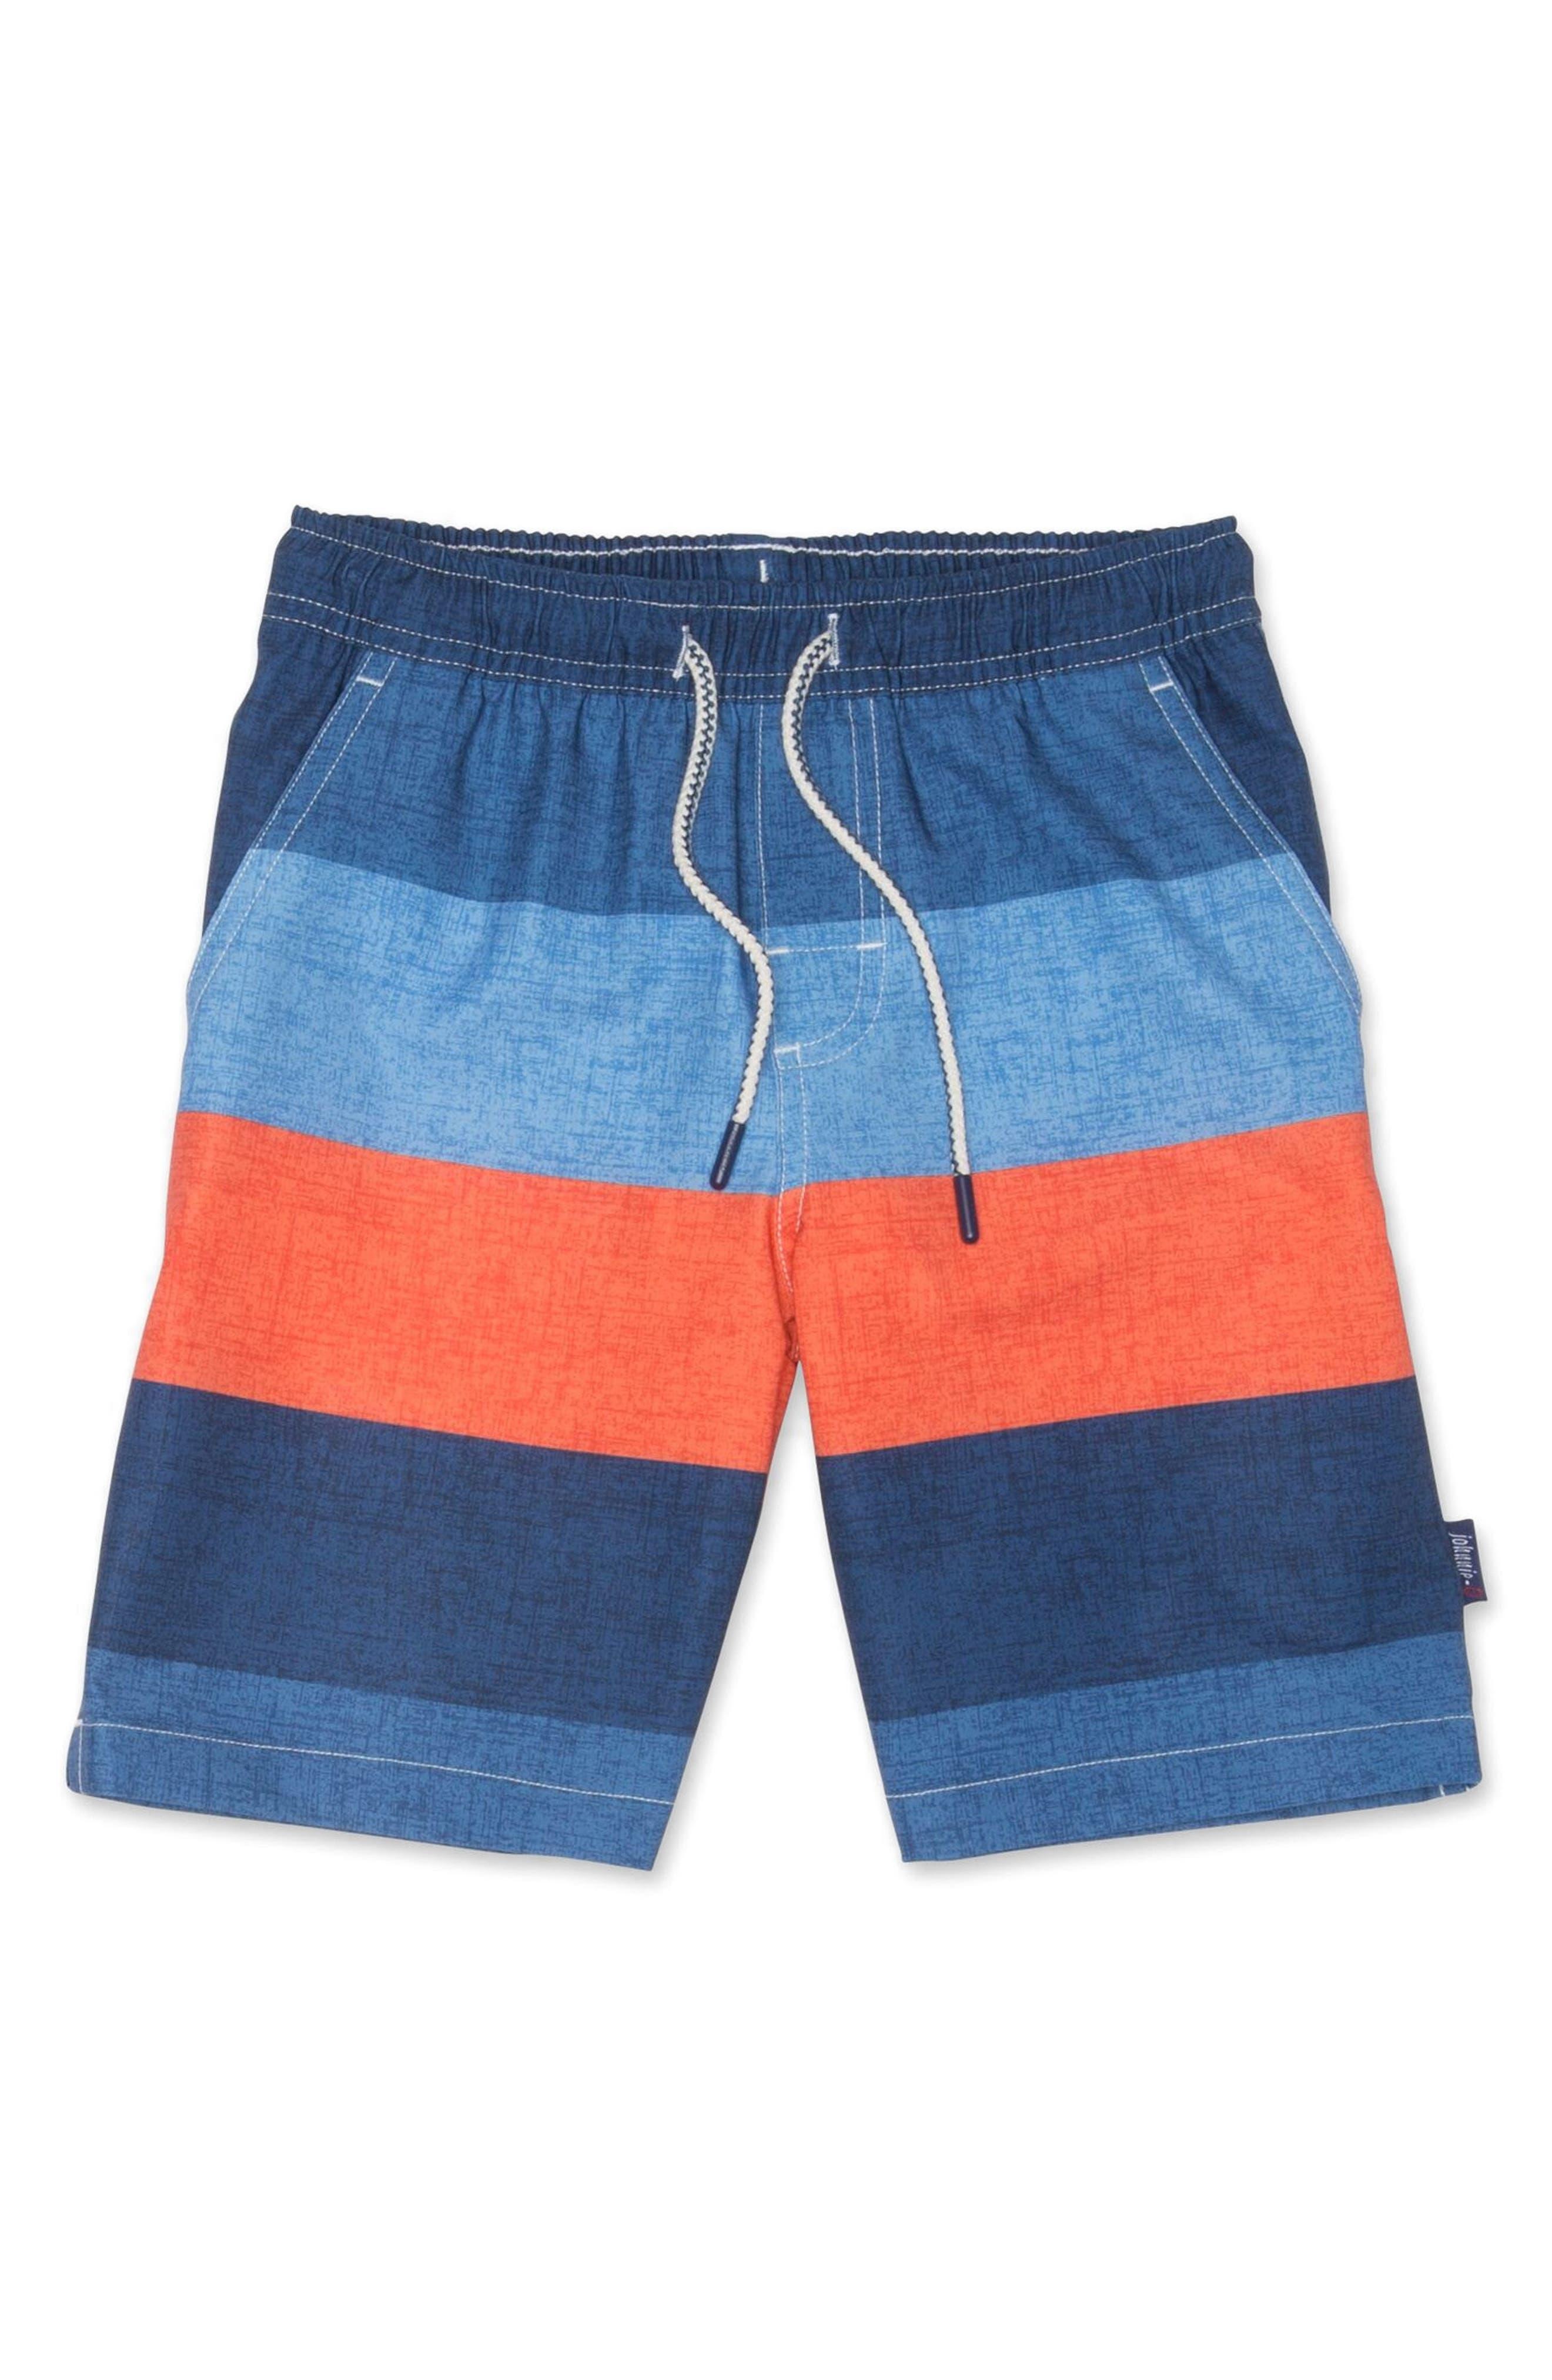 Shore Swim Trunks,                         Main,                         color, 404